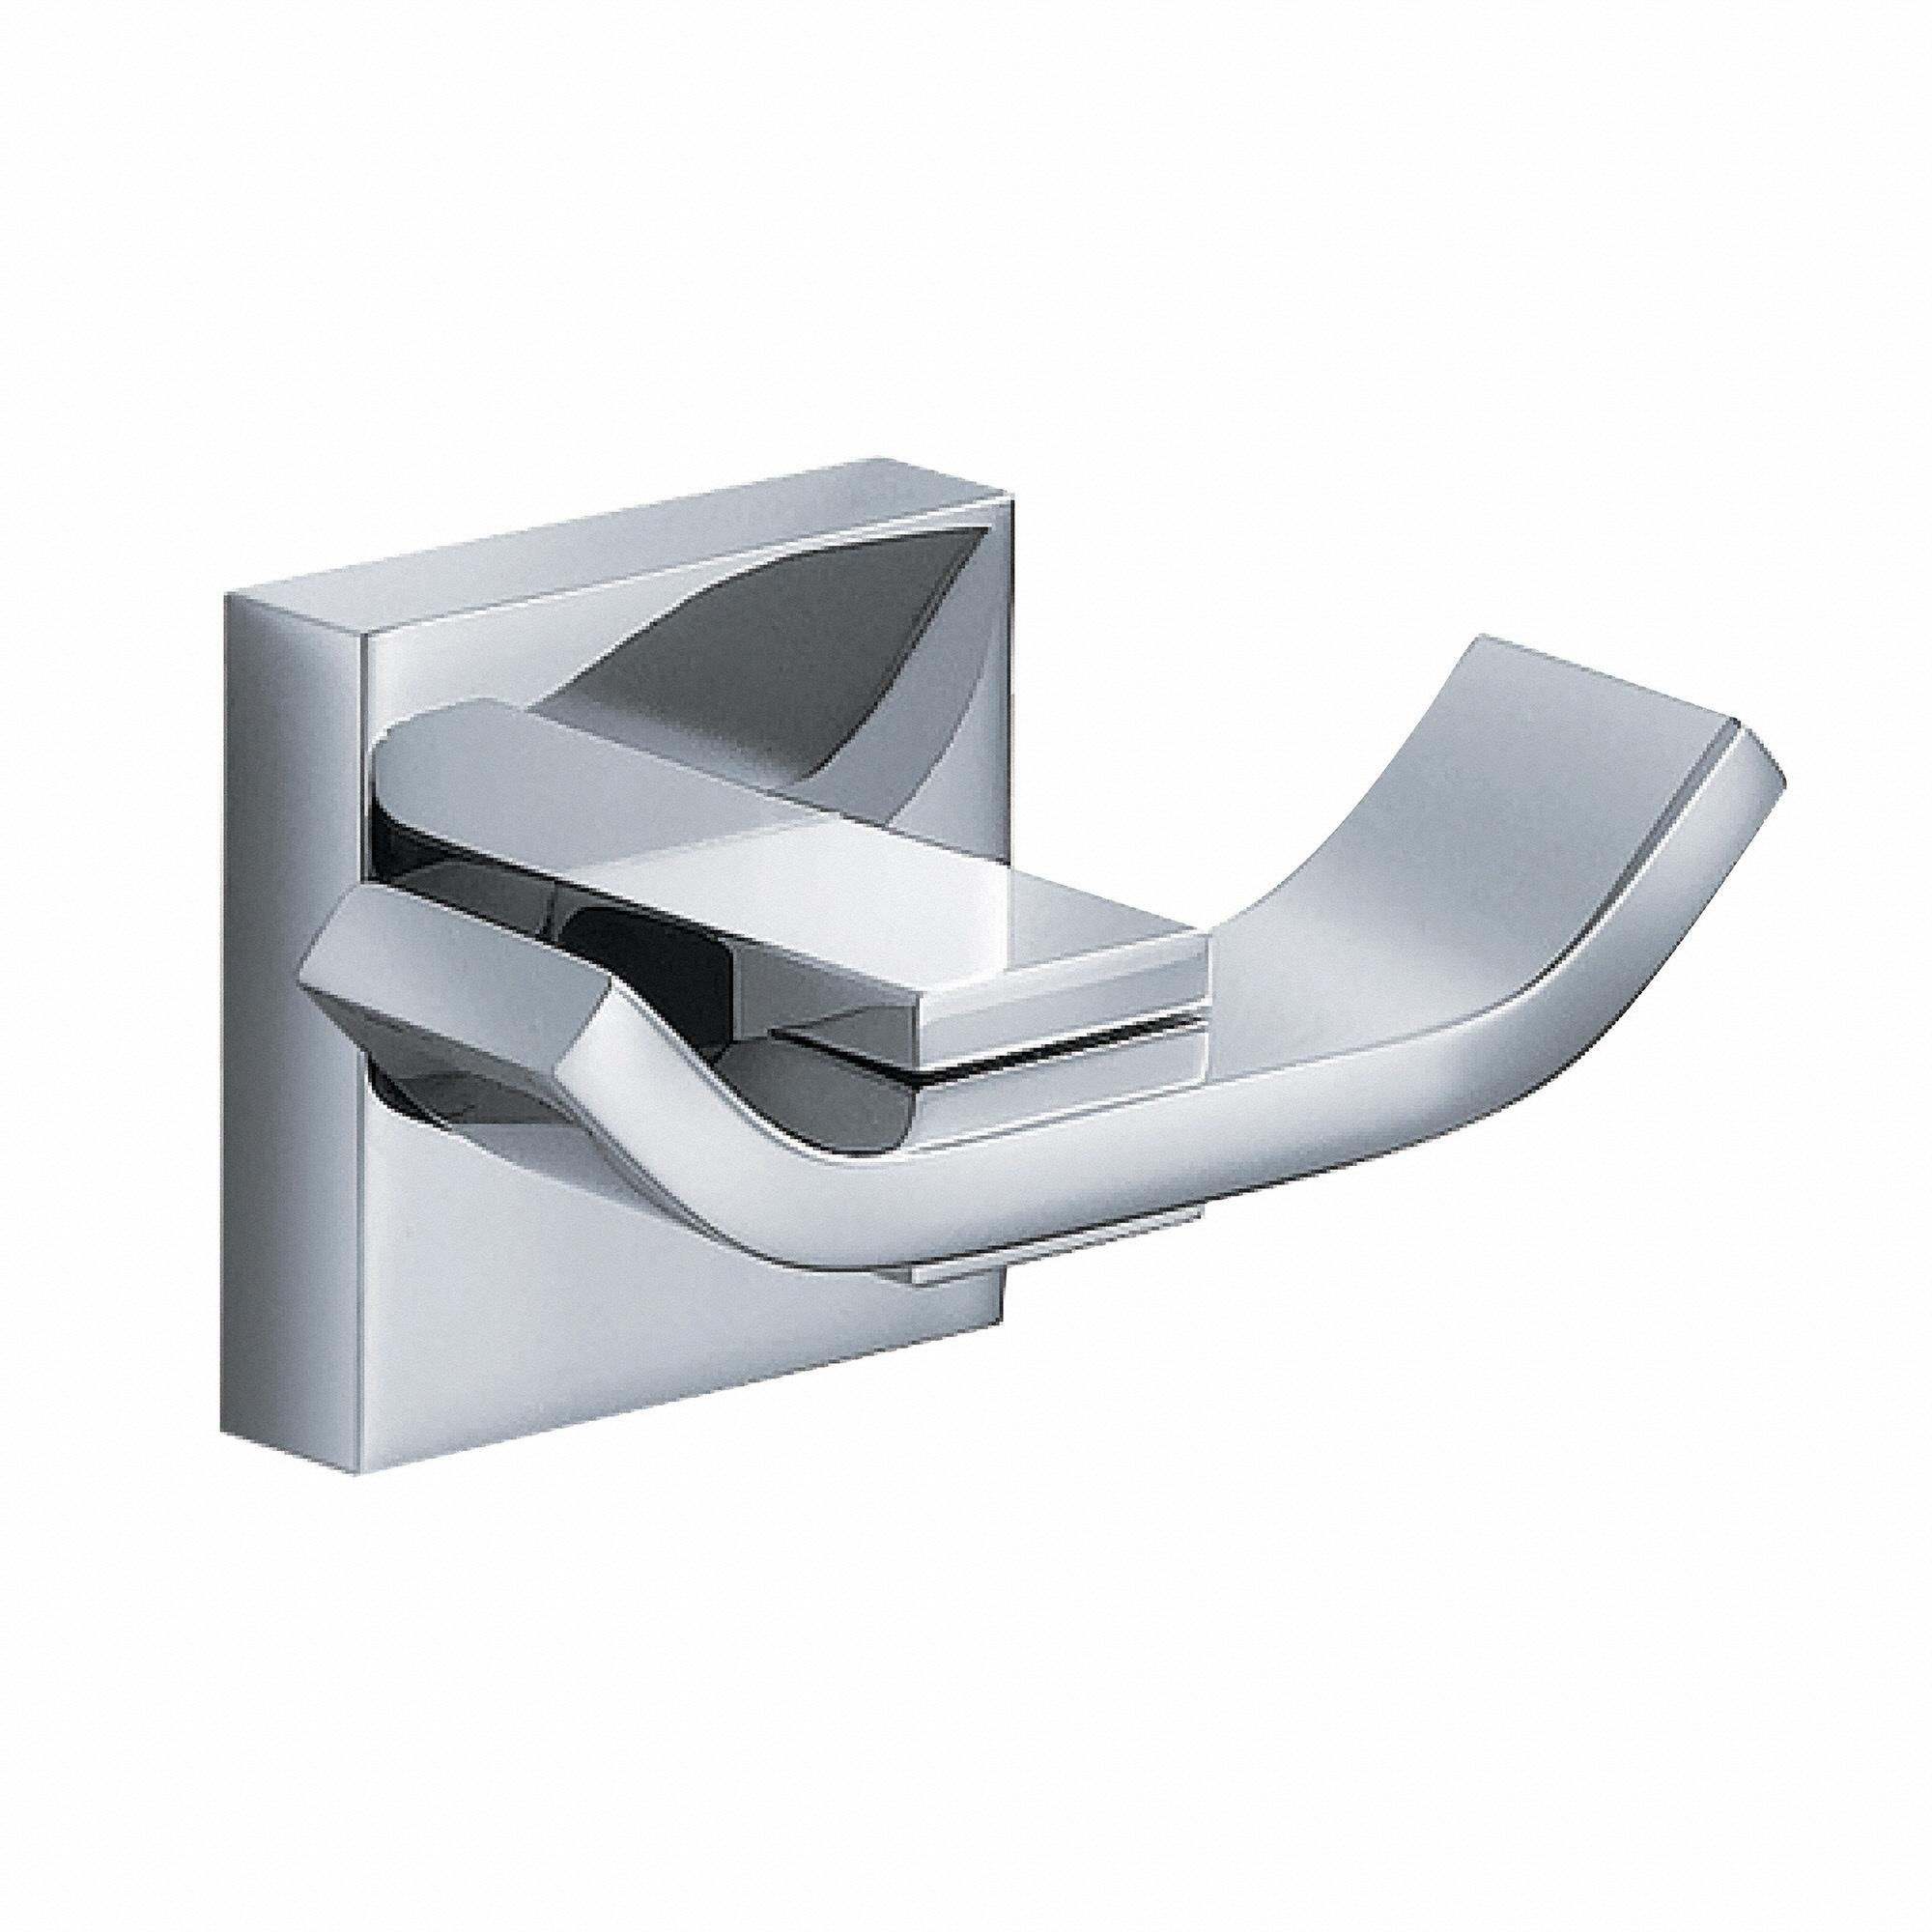 KRAUS Bathroom Accessories - Double Hook in Chrome (Chrome)